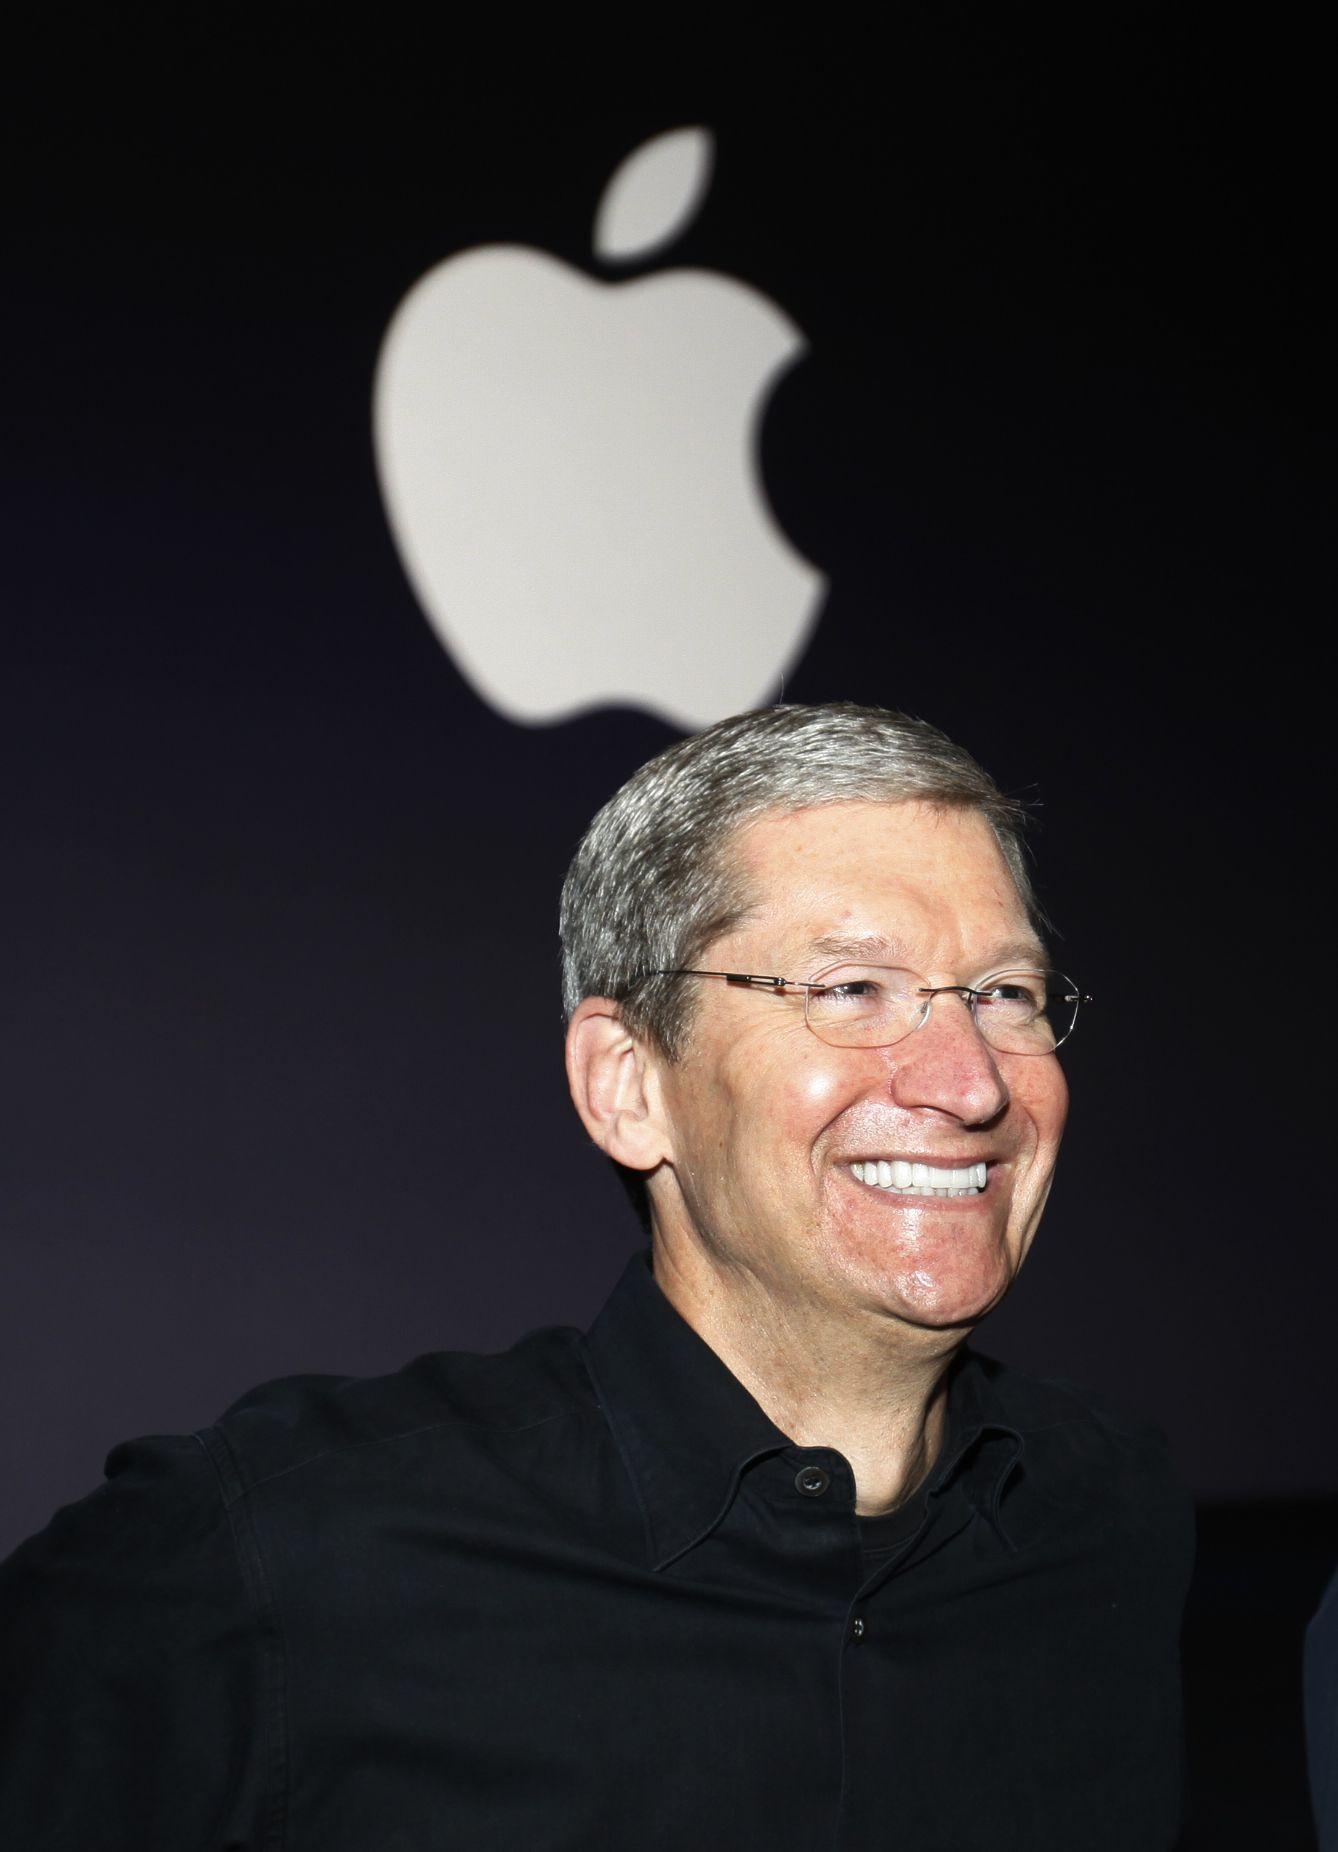 Apple / Tim Cook